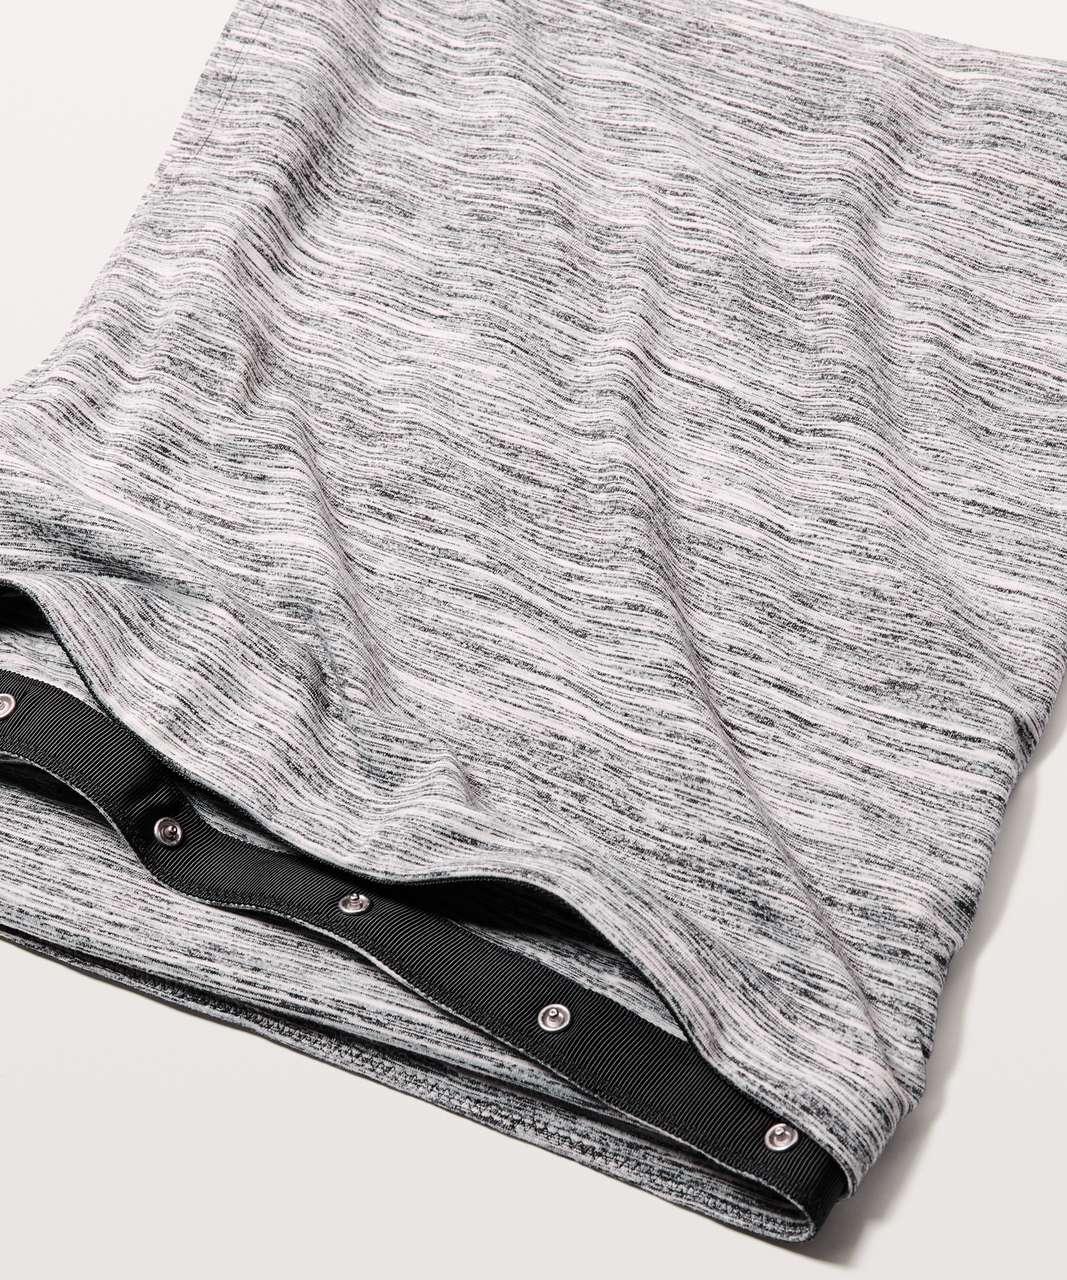 Lululemon Vinyasa Scarf *Rulu - Space Dye Camo Black White